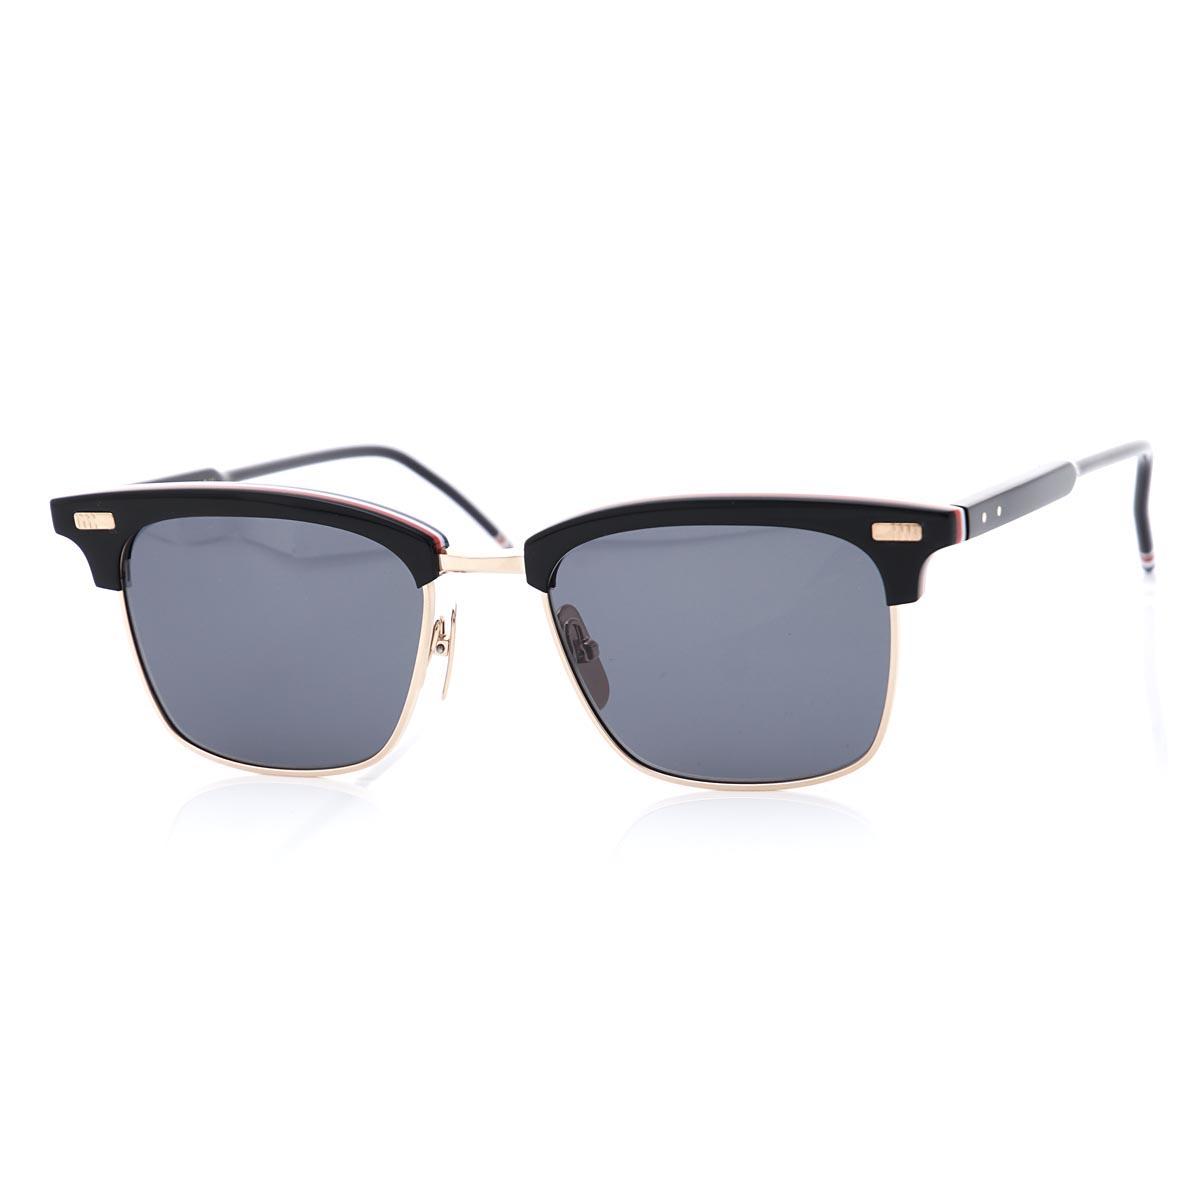 c9329b42059b Tom Browne THOM BROWNE. Sunglasses black men gift present tb 711 a t blk  gld 52 Wellington